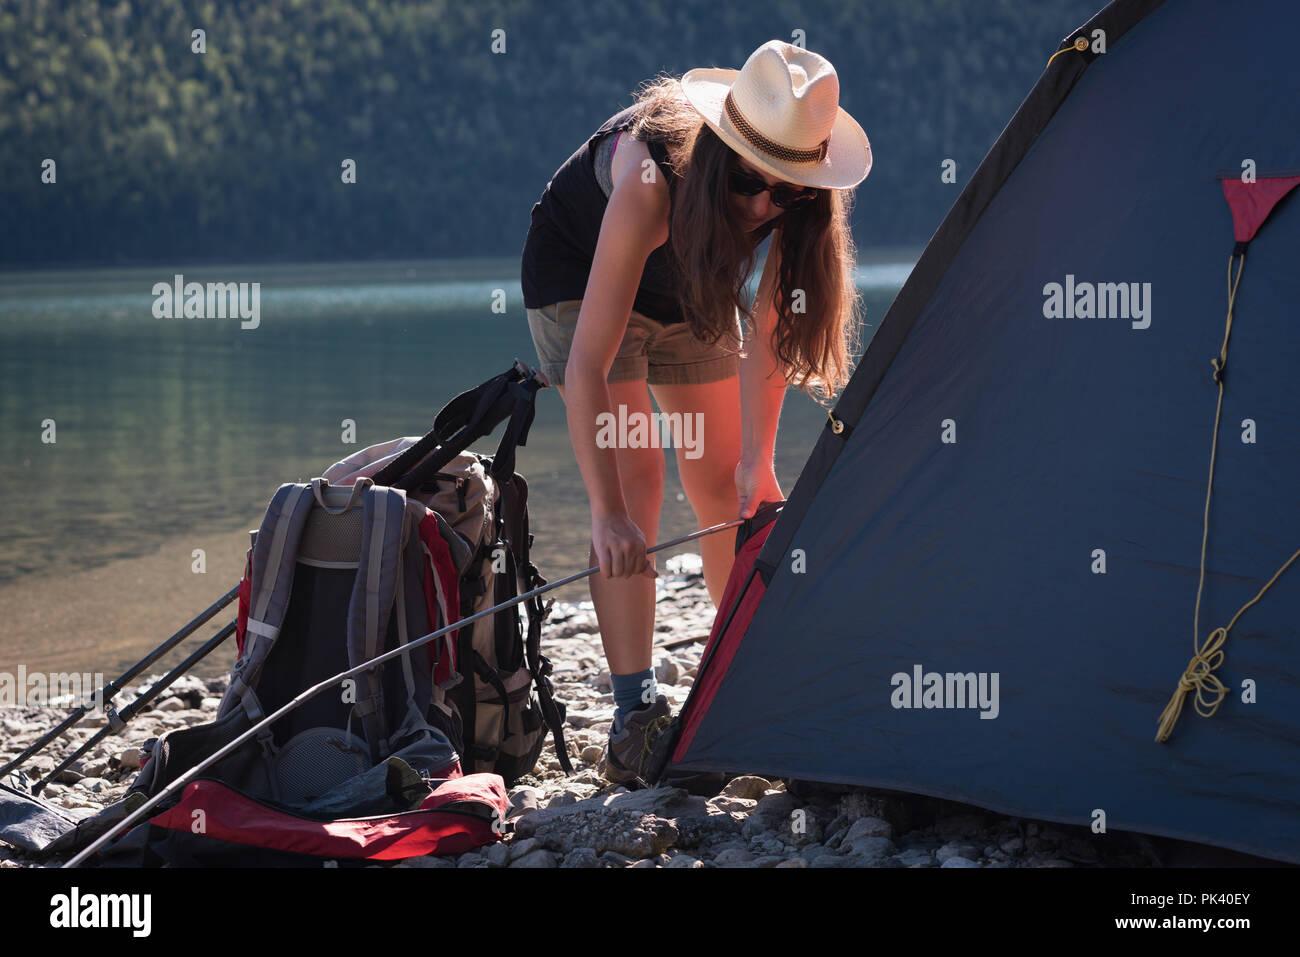 Femme setting up tent Banque D'Images